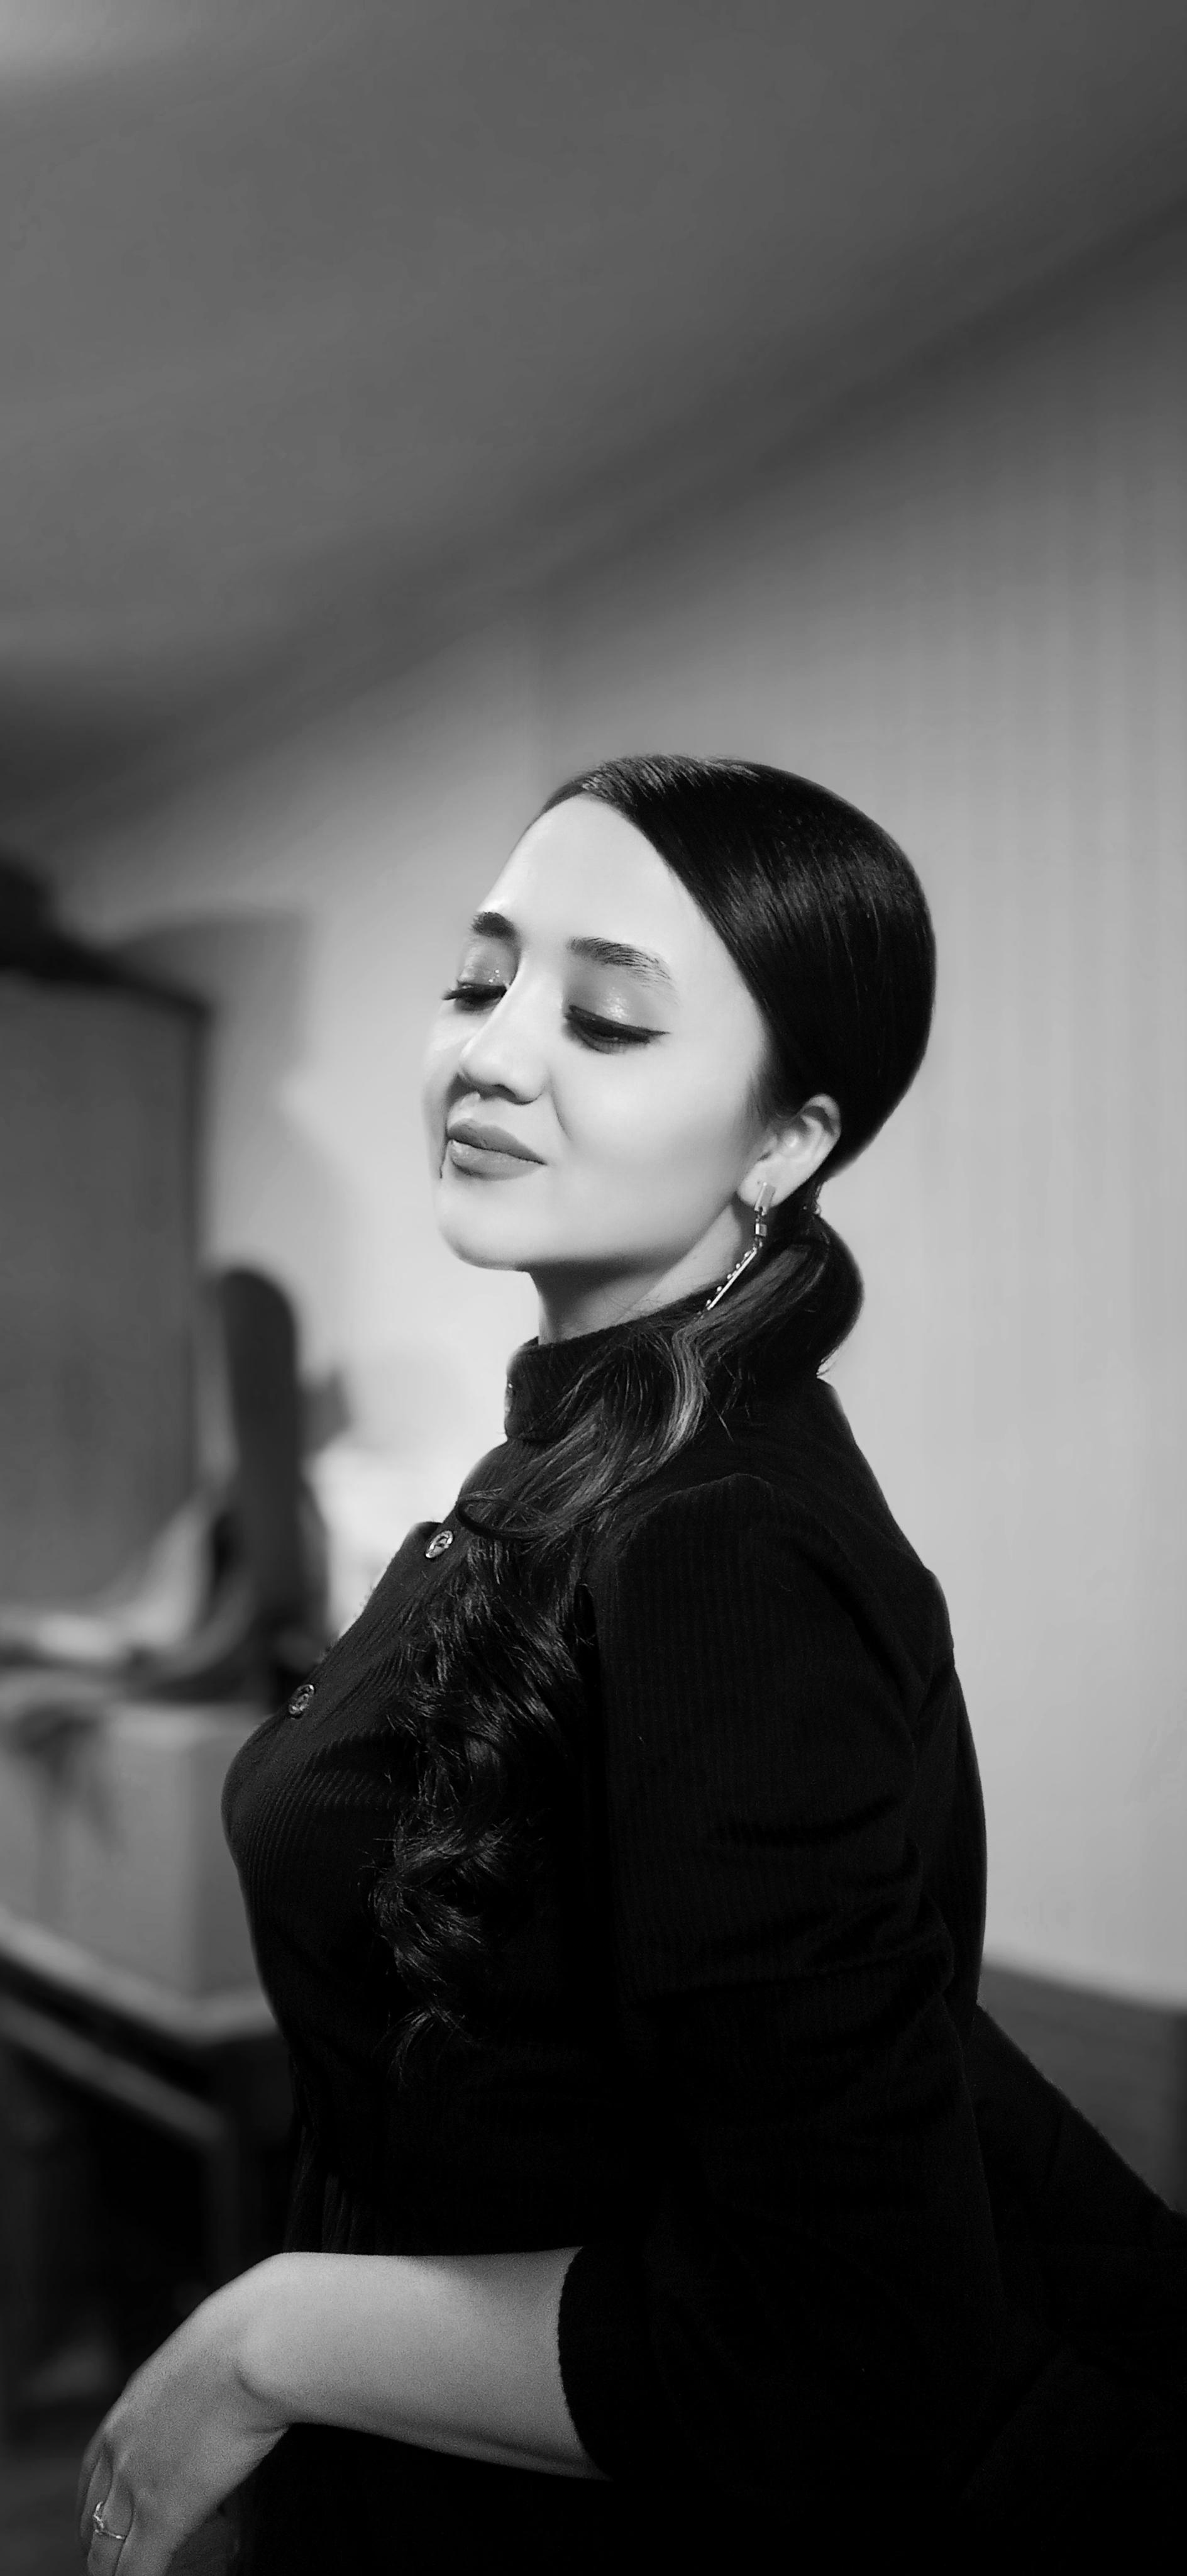 Zarin - Yurak (cover version)